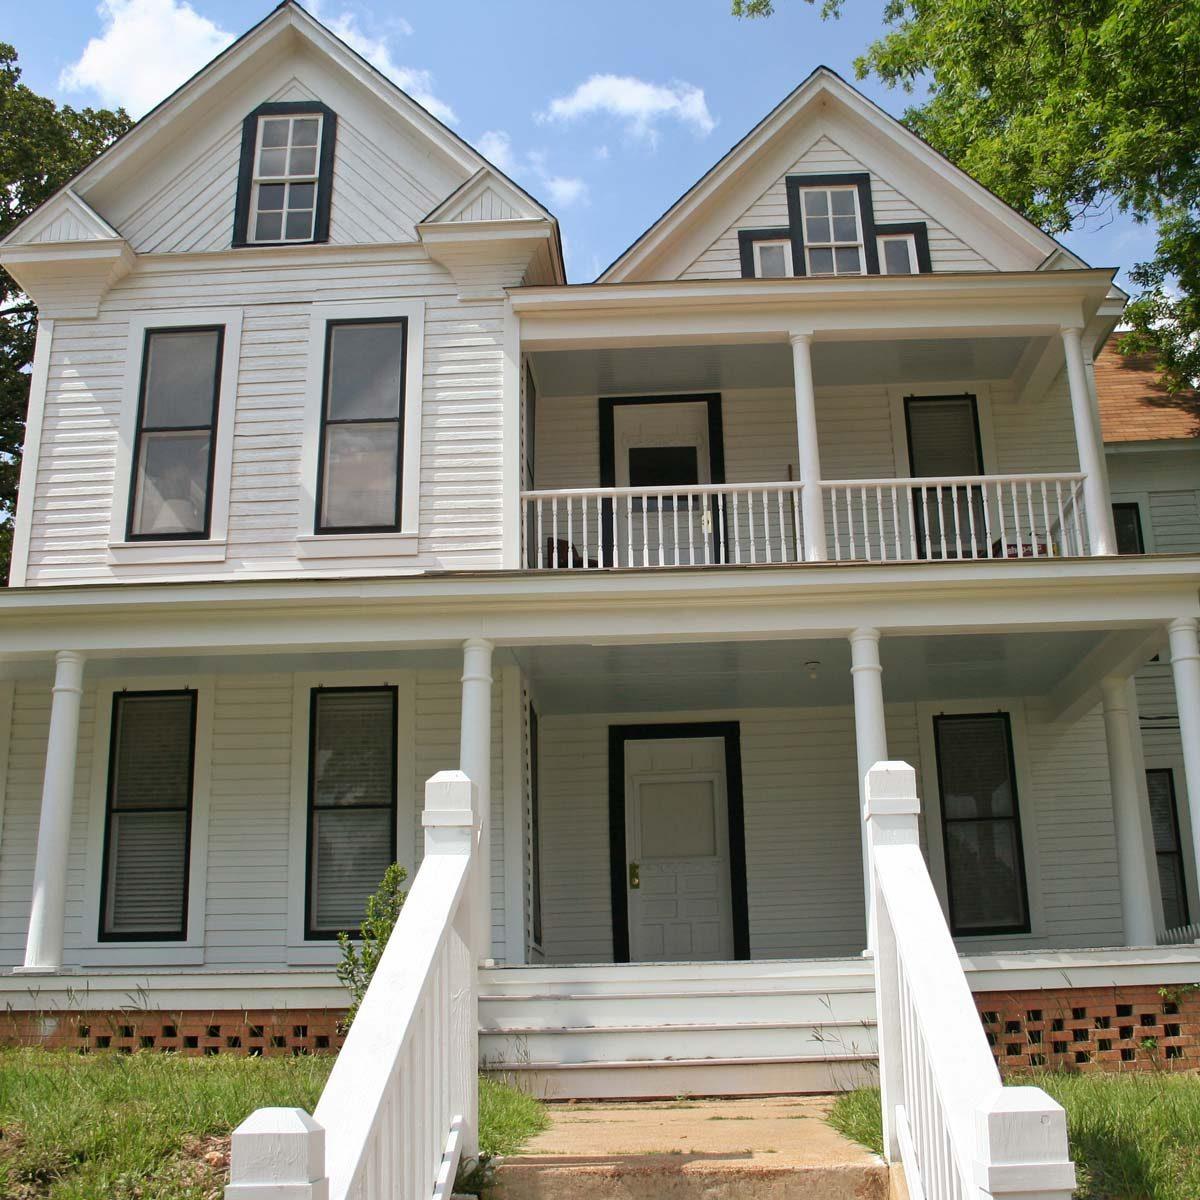 white colored historic farmhouse style home